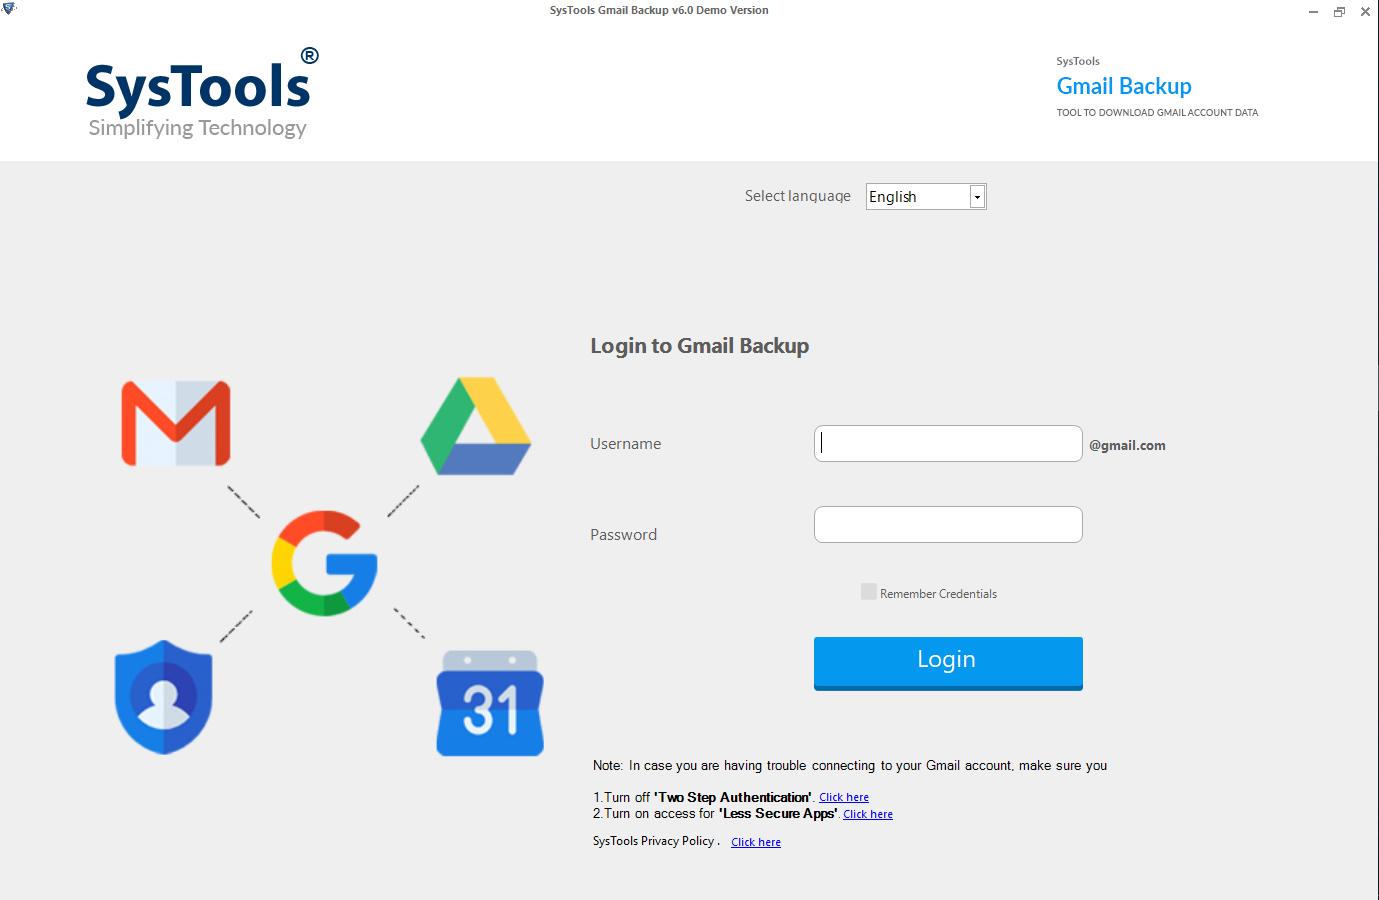 launch tool